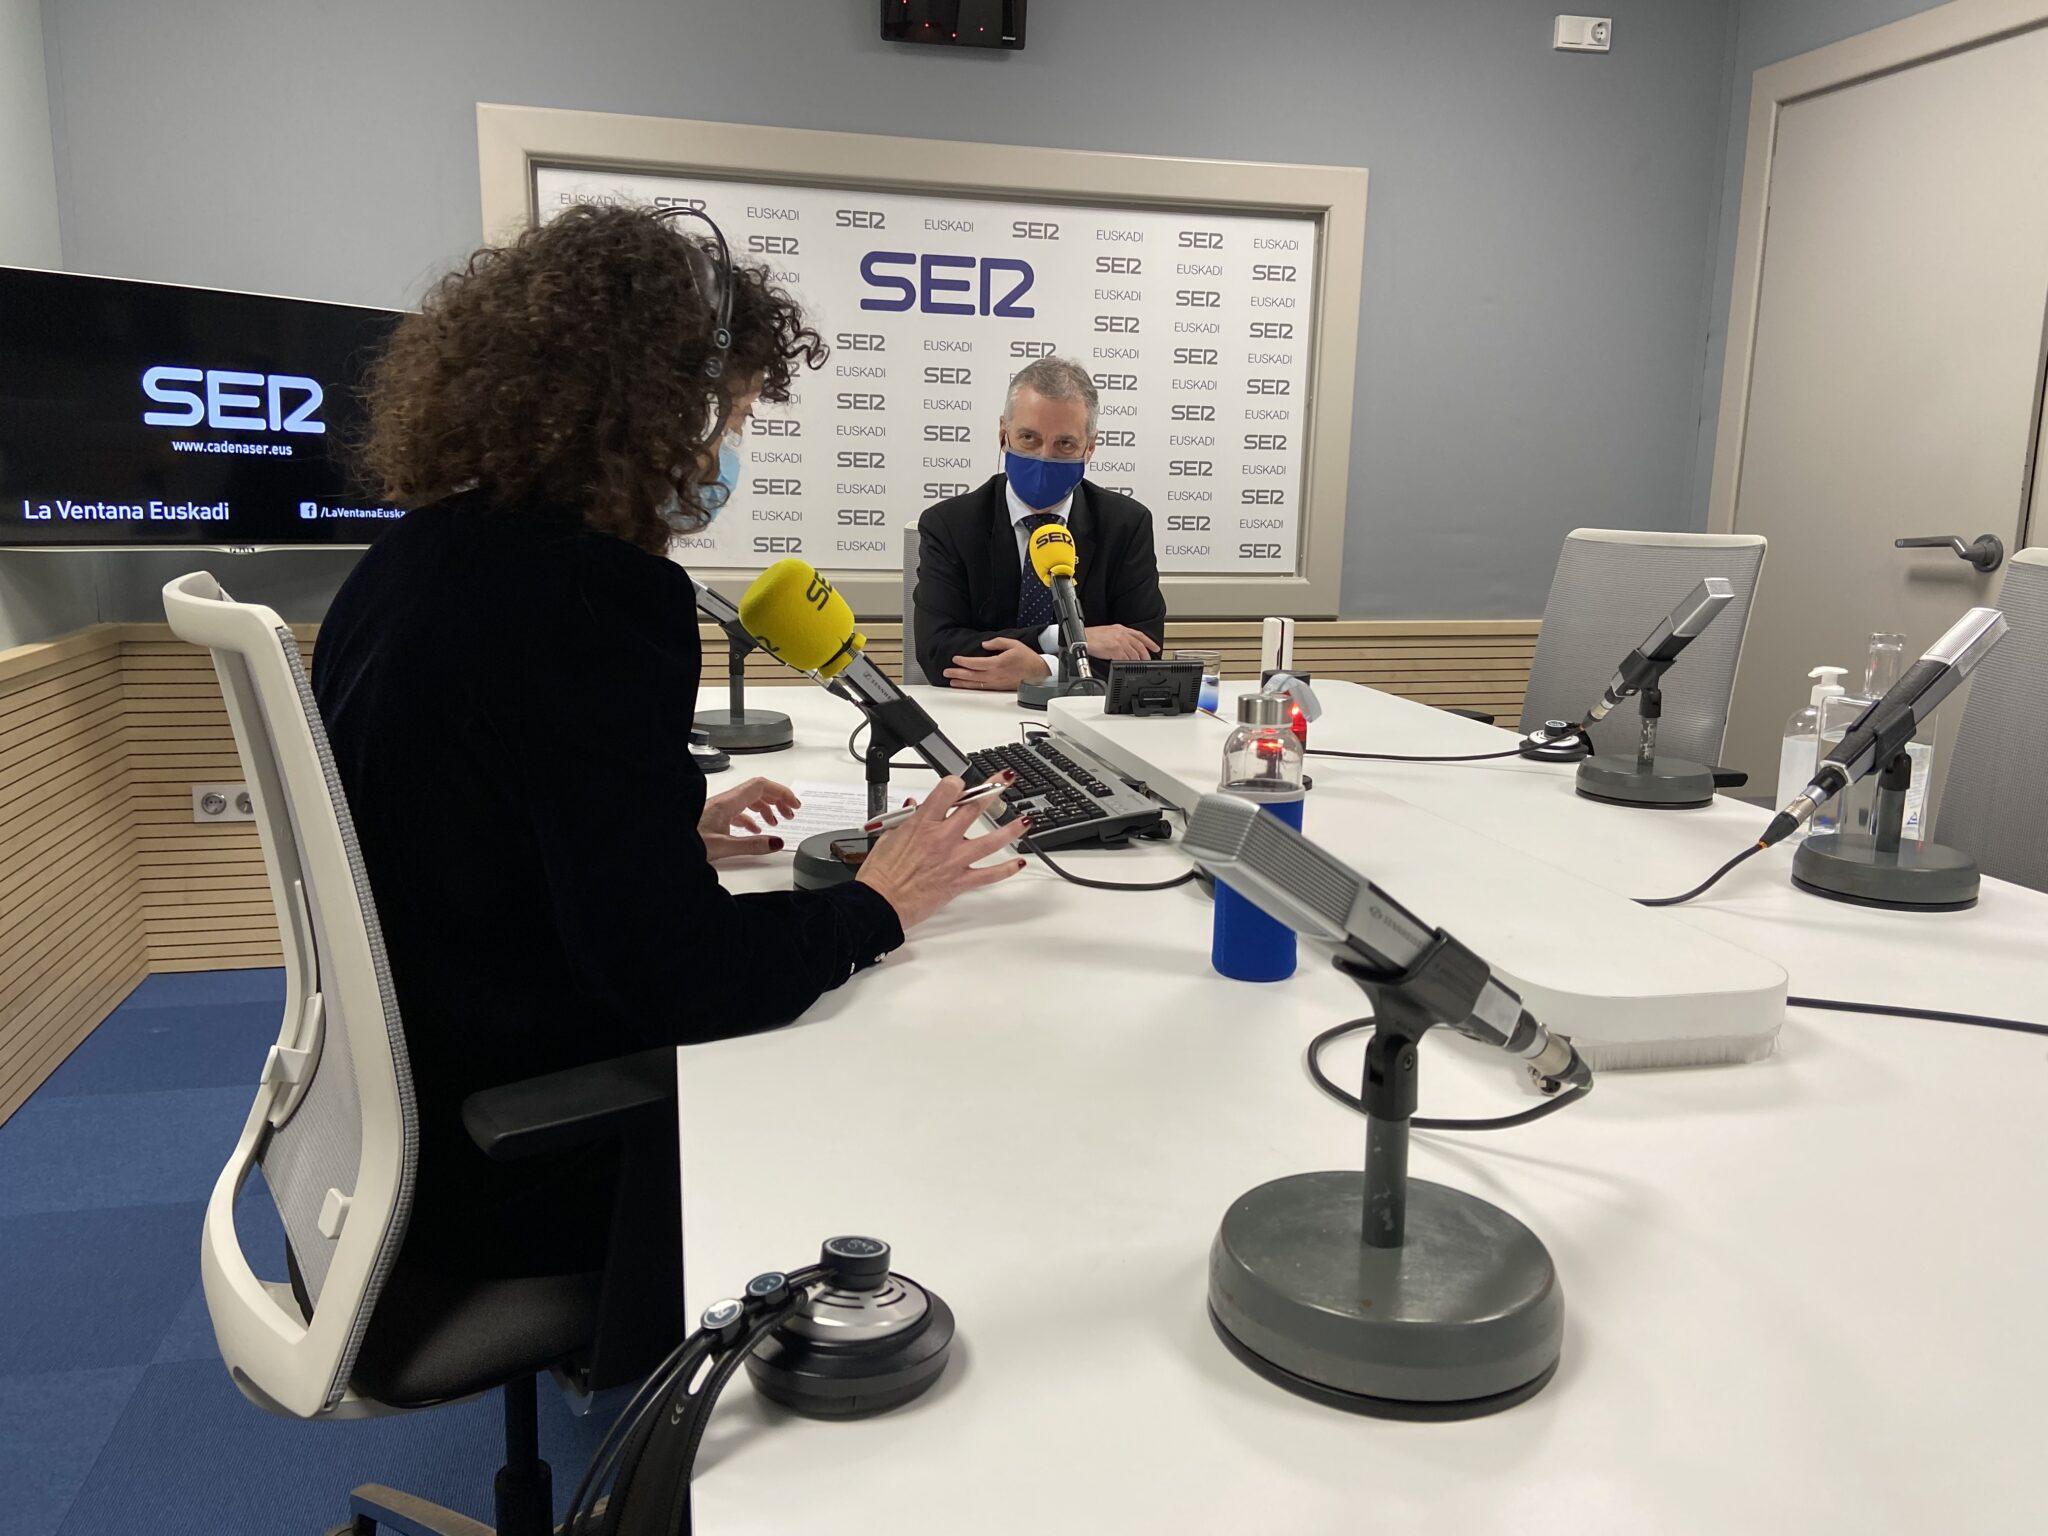 Urkullu durante la entrevista en La Ventanade la SER. Foto. Gobierno vasco